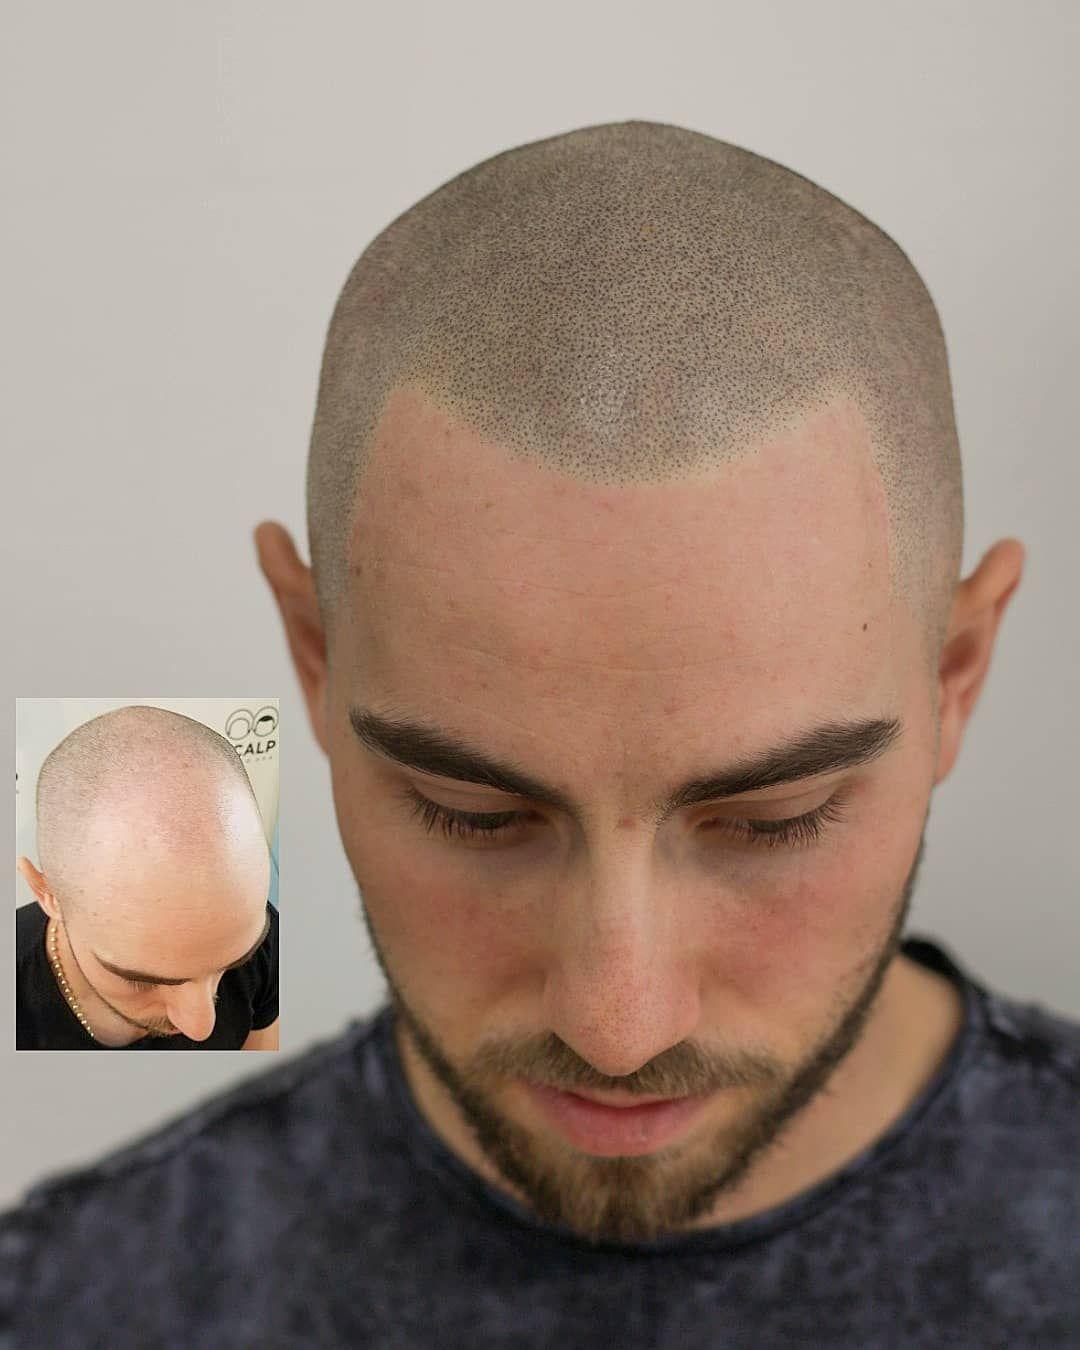 19+ Haircut close to scalp ideas in 2021